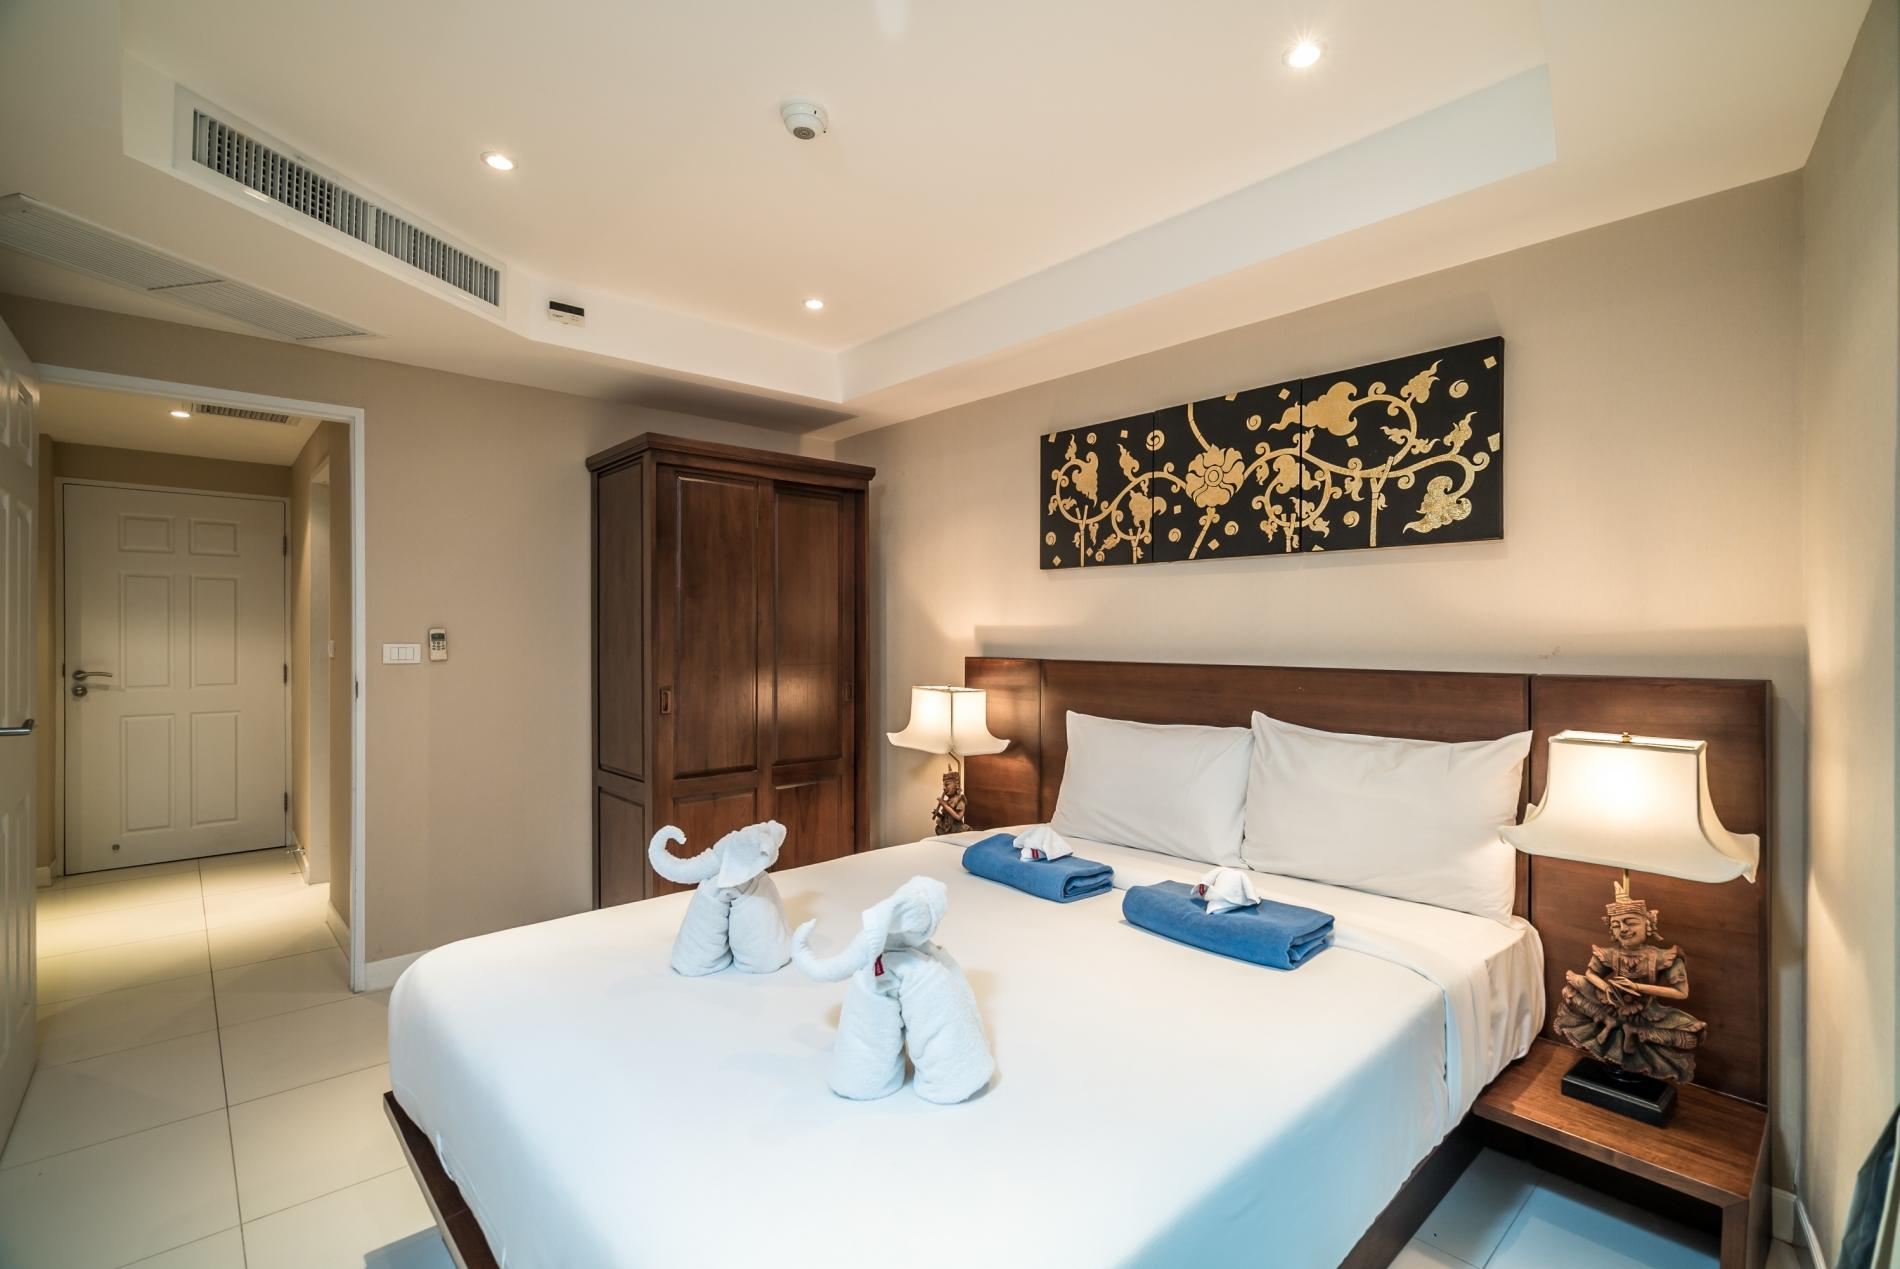 Apartment Kata Ocean View condominium - 1 bdr mountain view apartment photo 20185747